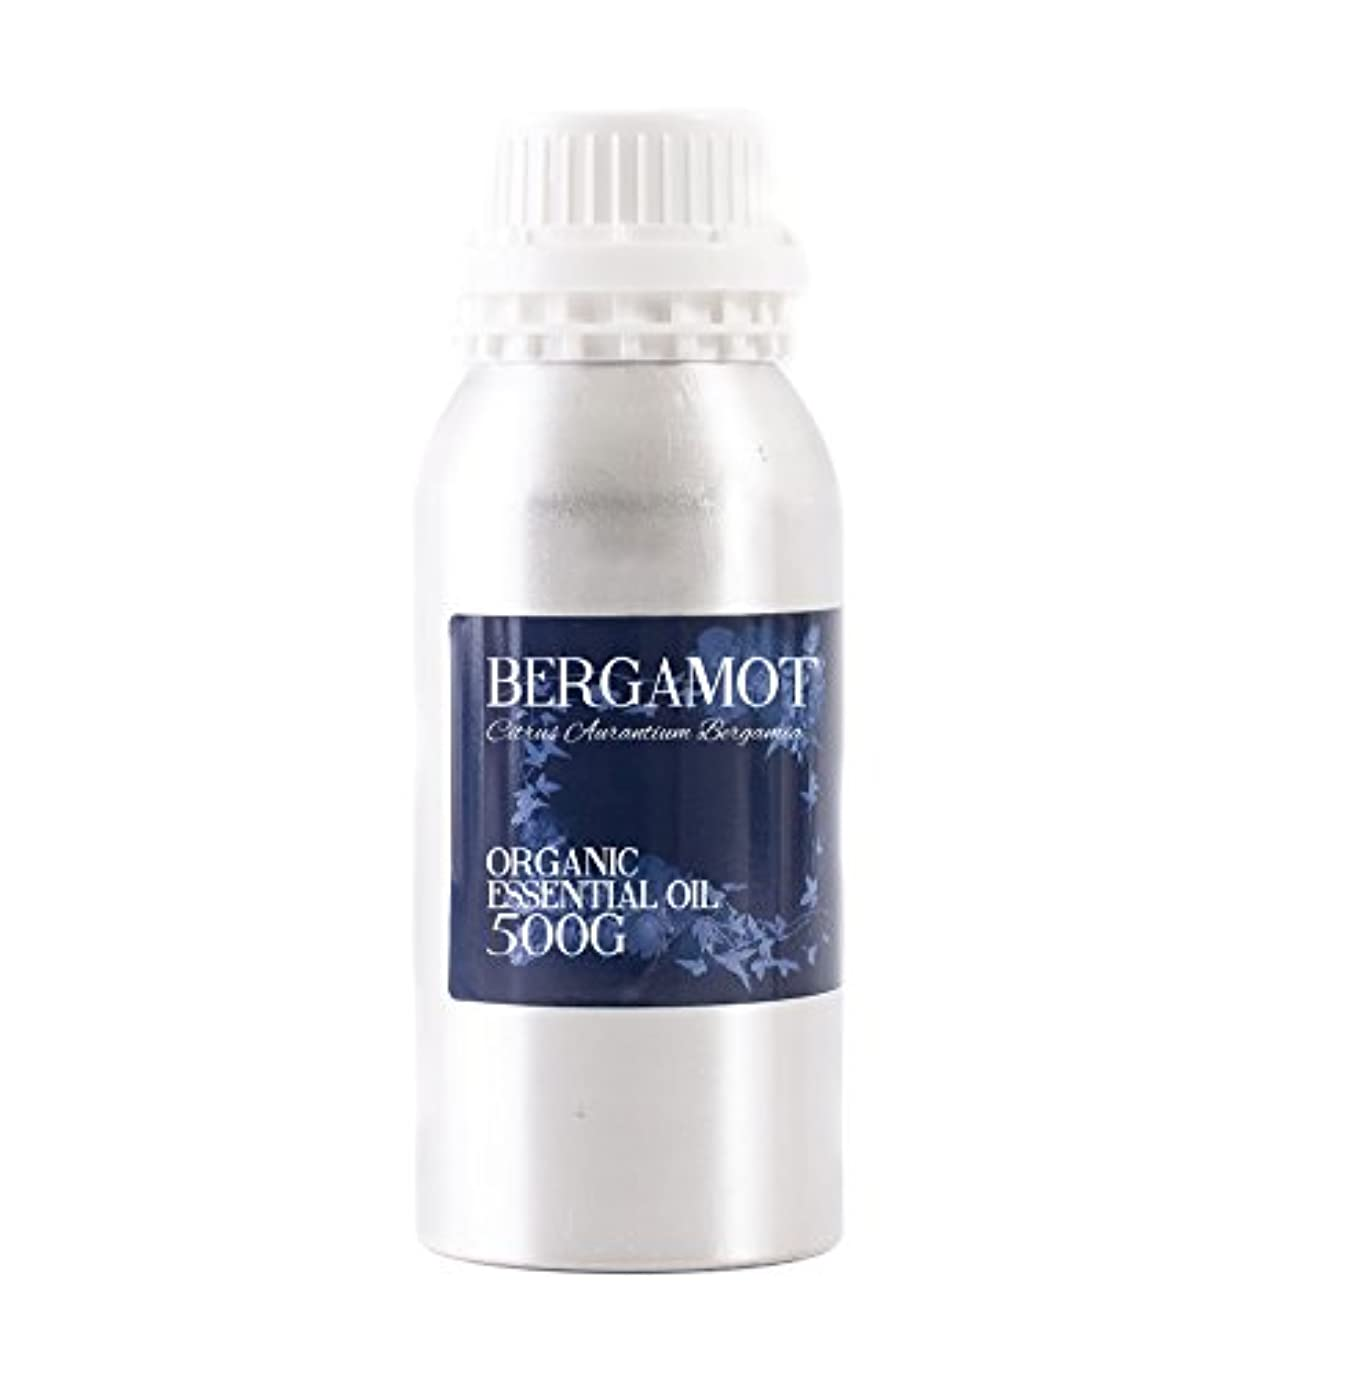 Mystic Moments | Bergamot Organic Essential Oil - 500g - 100% Pure